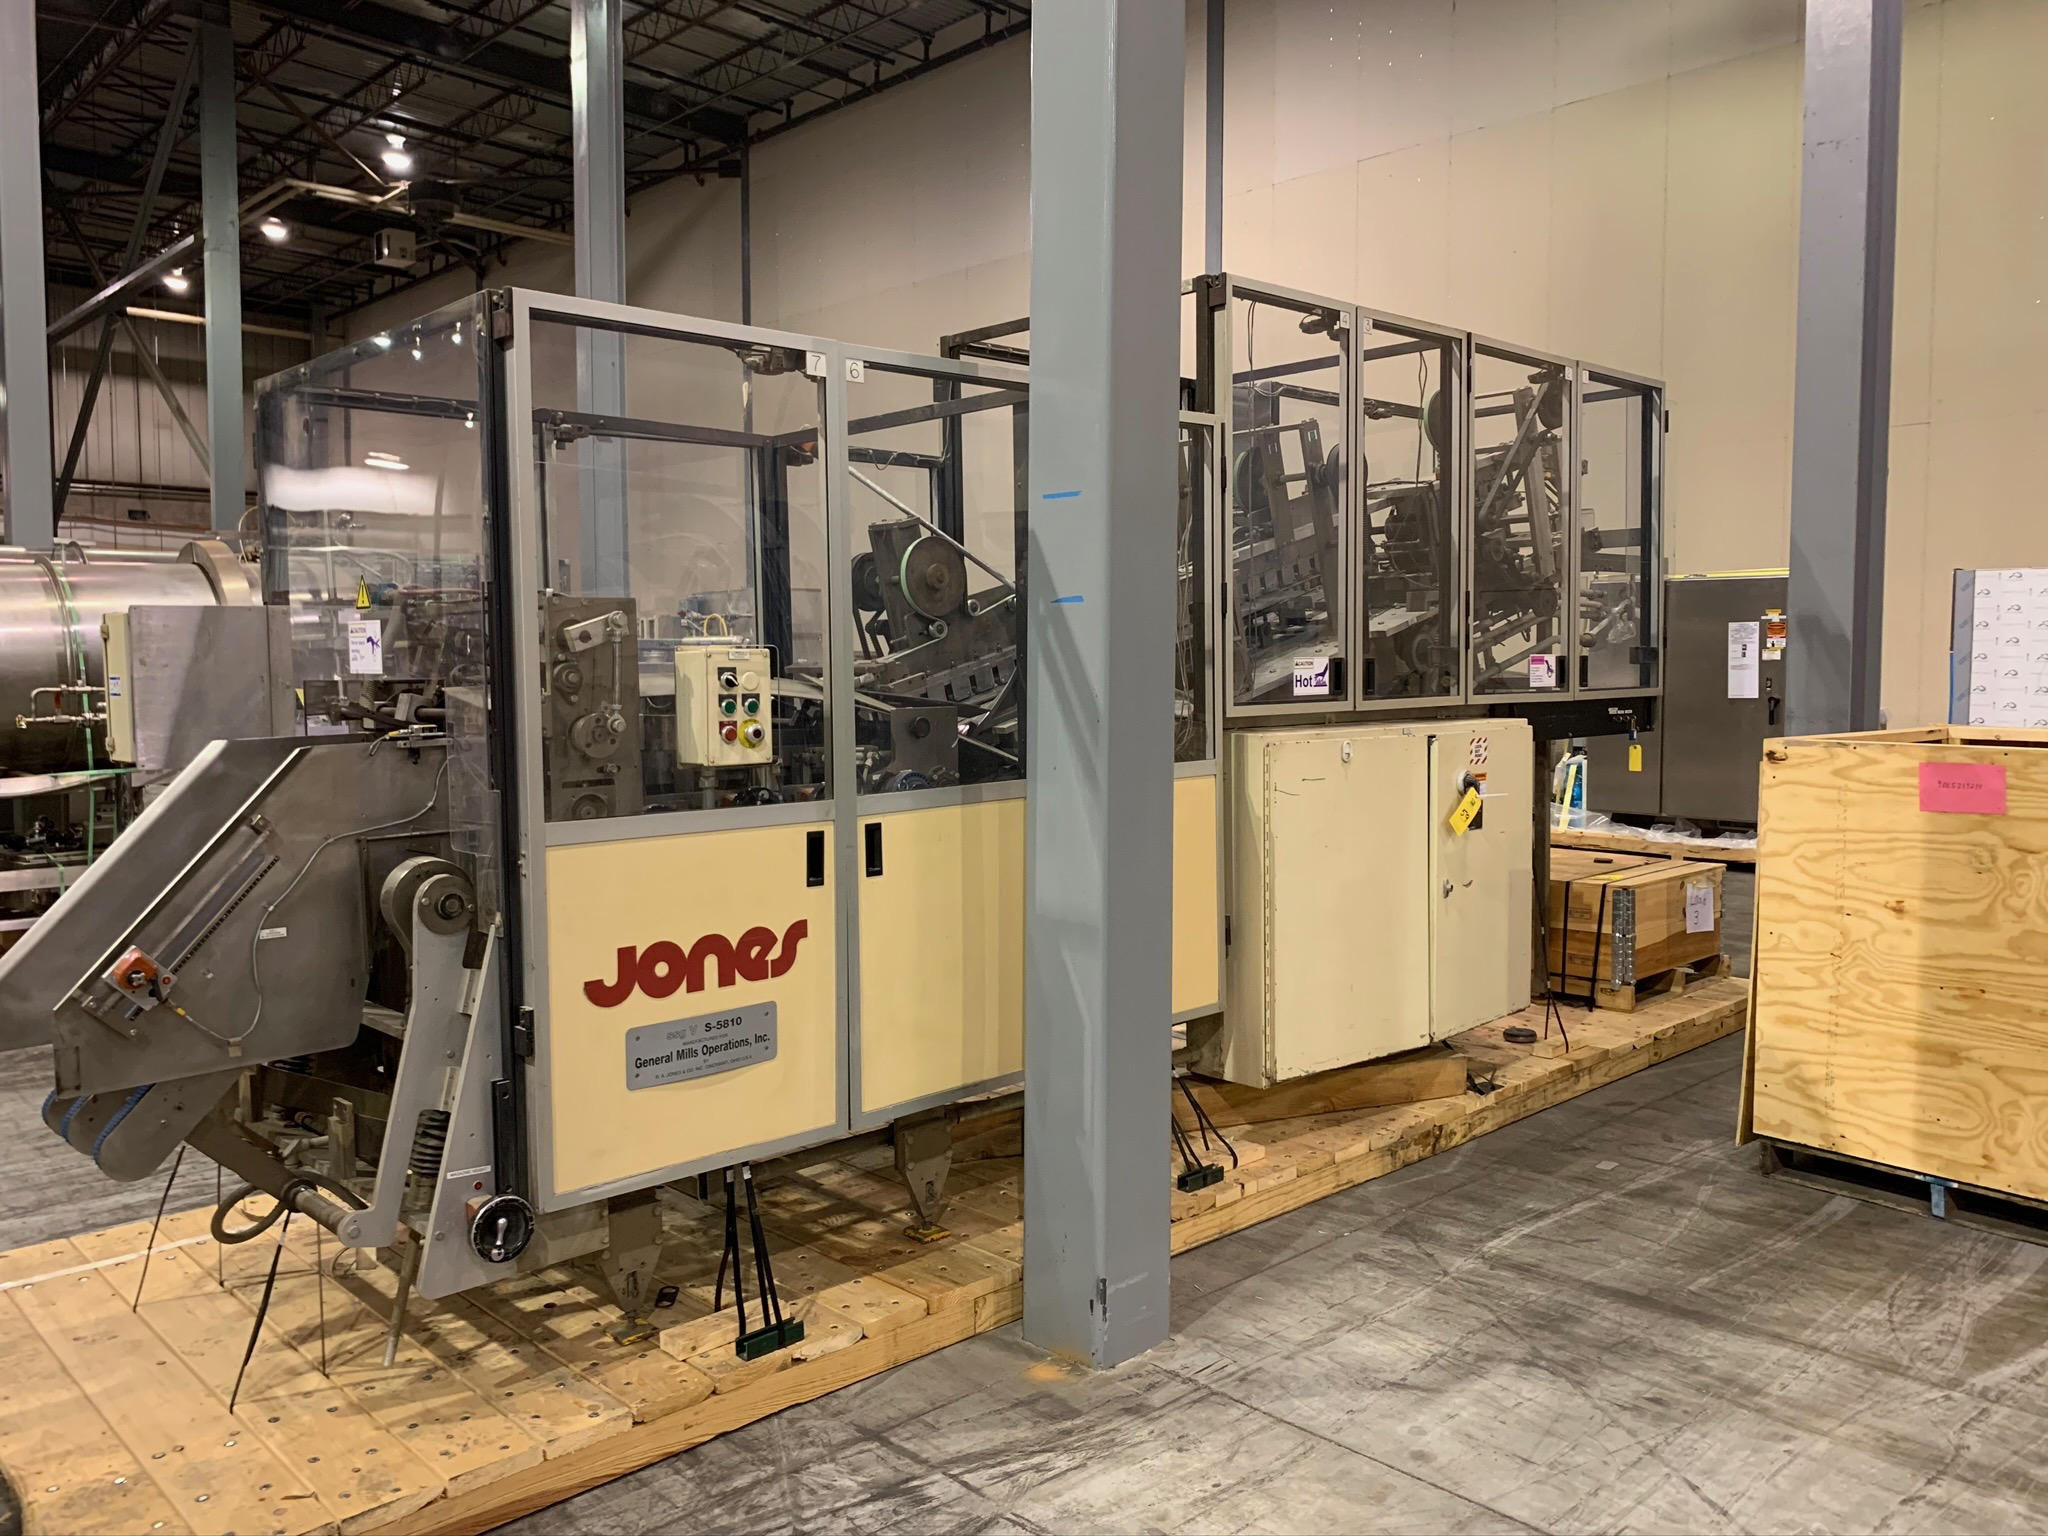 Jones Centurion Side Seam Gluer S/N S-5810 (Rigging Fee - $250)